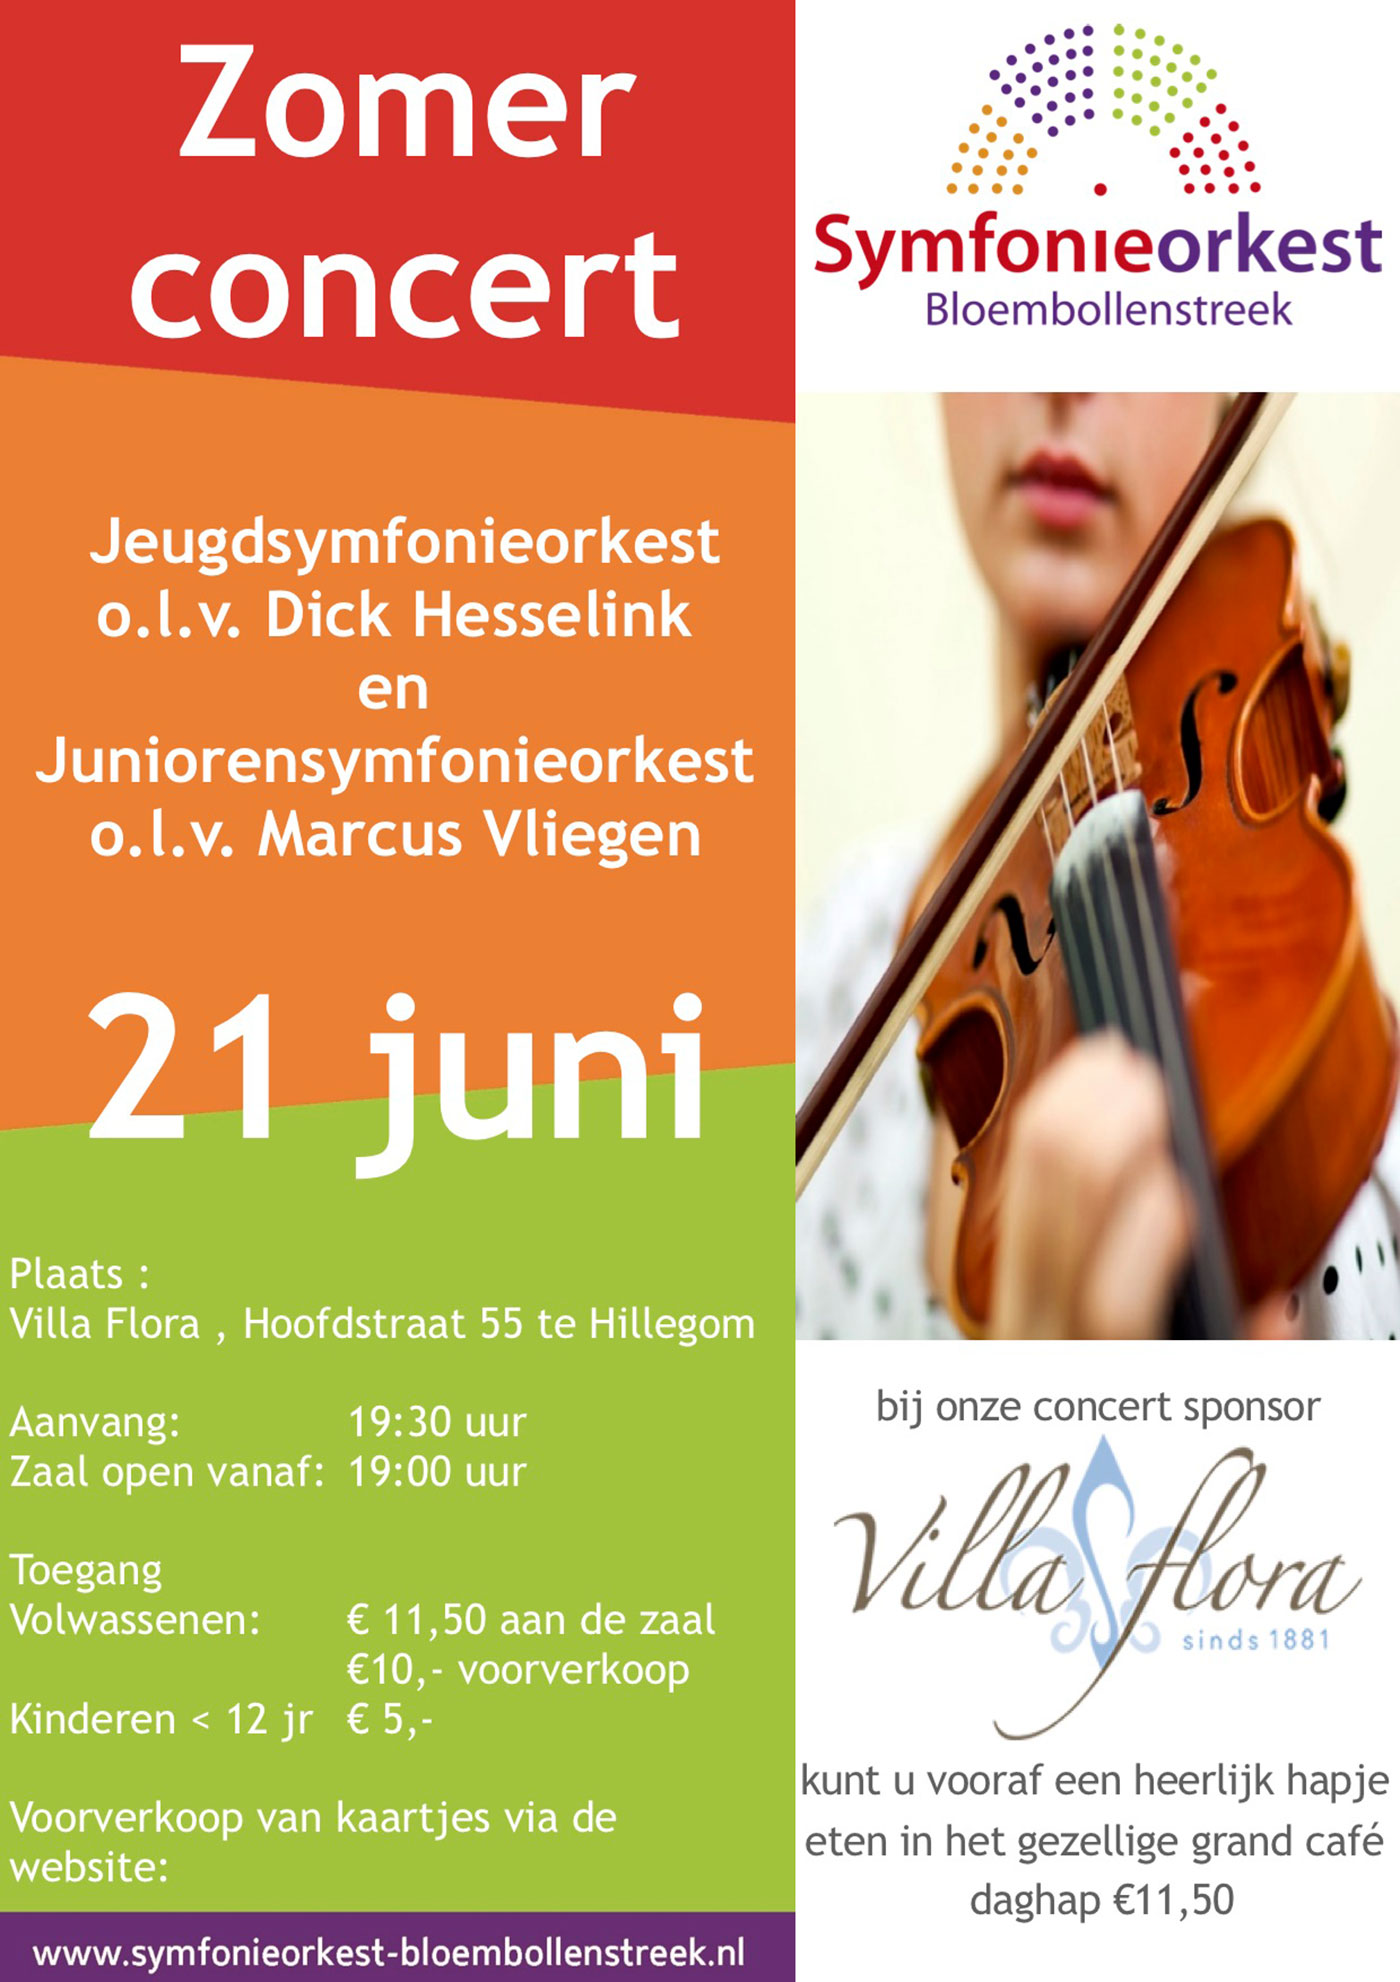 2019 06 21 Poster Zomerconcert Symfonieorkest Bloembollenstreek